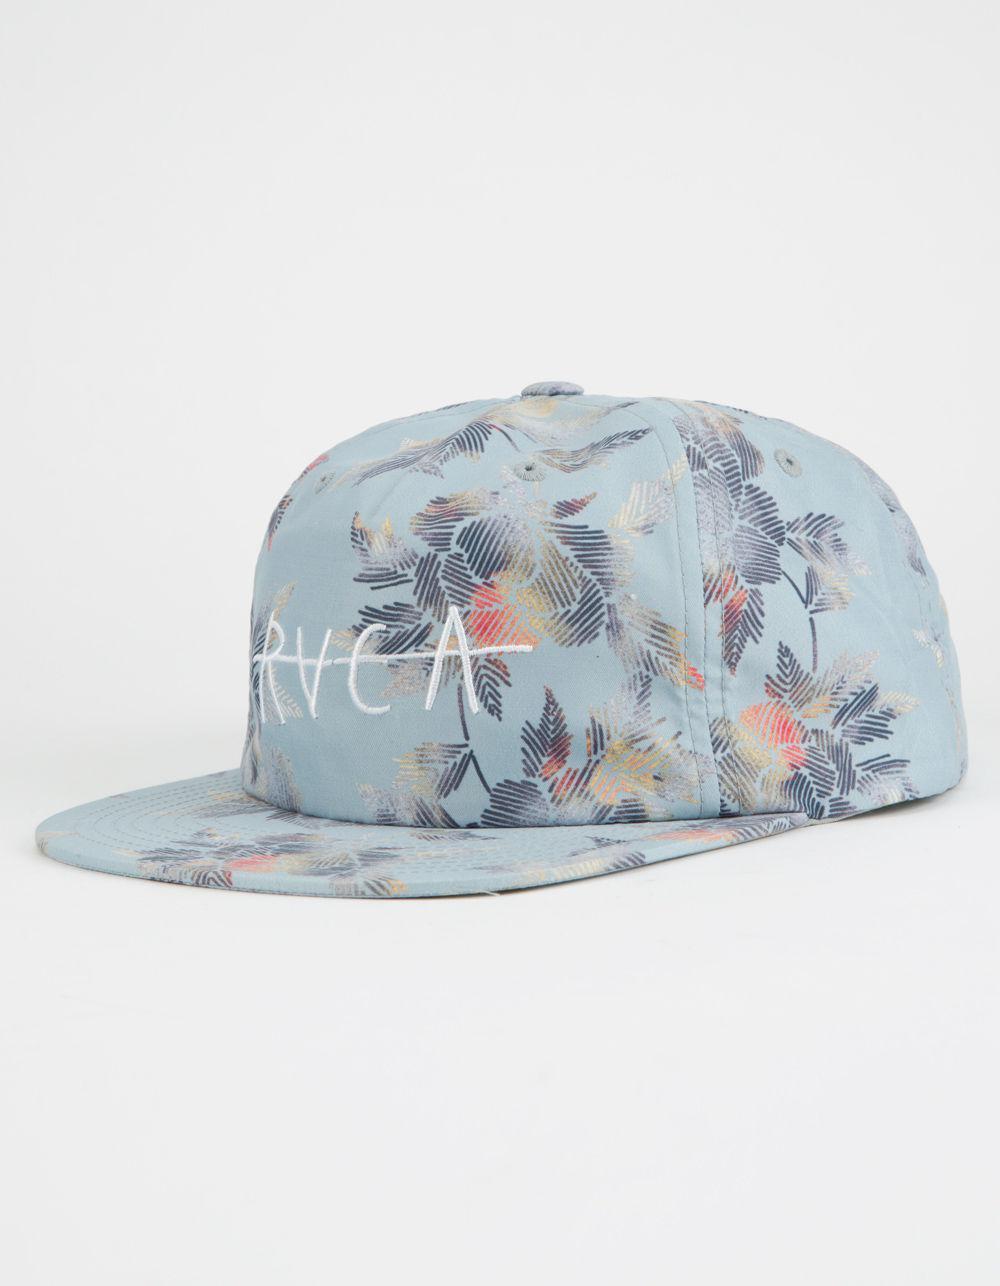 2114c68107484 ... shopping lyst rvca bora unstructured mens strapback hat in blue for men  de3bd b99de